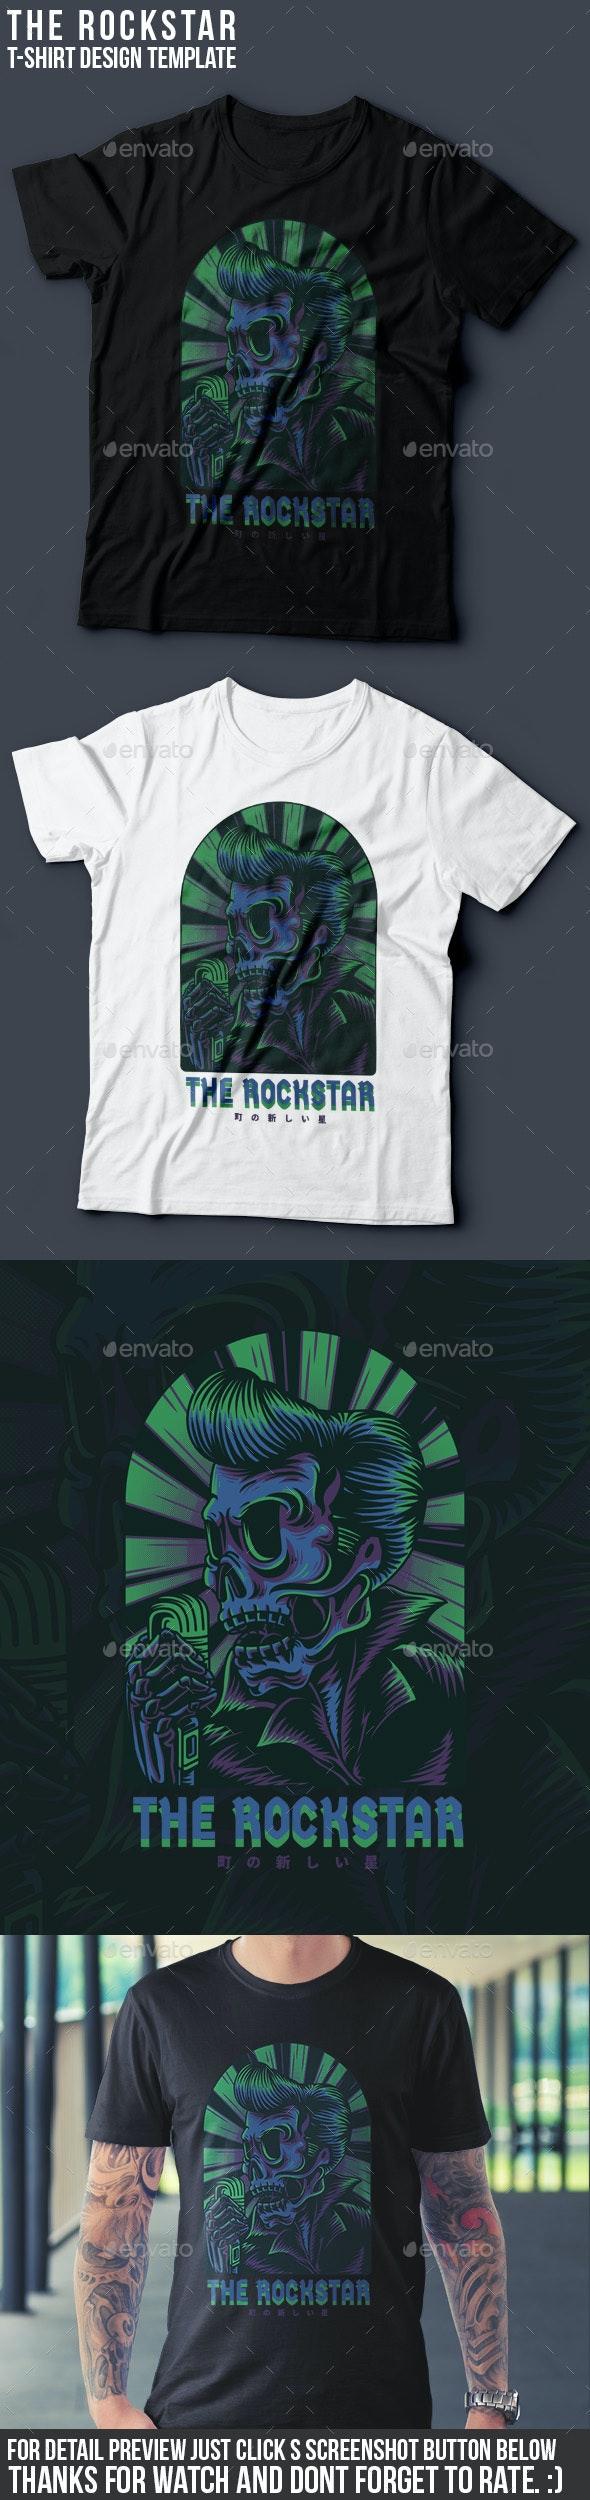 The Rockstar T-Shirt Design - Events T-Shirts